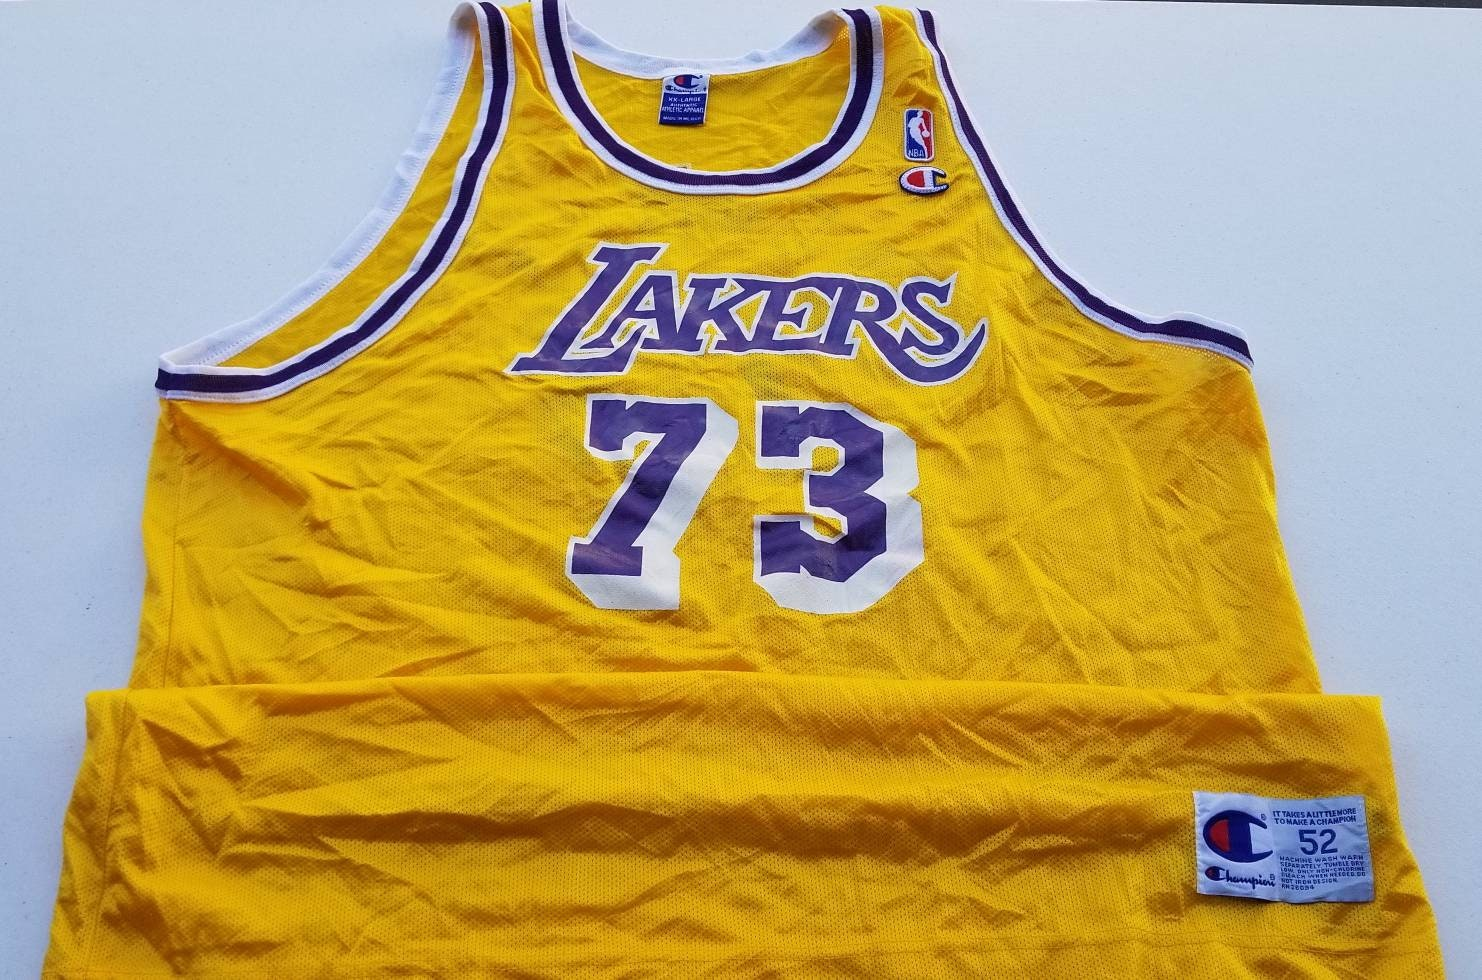 finest selection c99c0 7df76 Size 52/2XL dennis rodman jersey, lakers jersey, champion jersey size 52,  Lakers jersey,